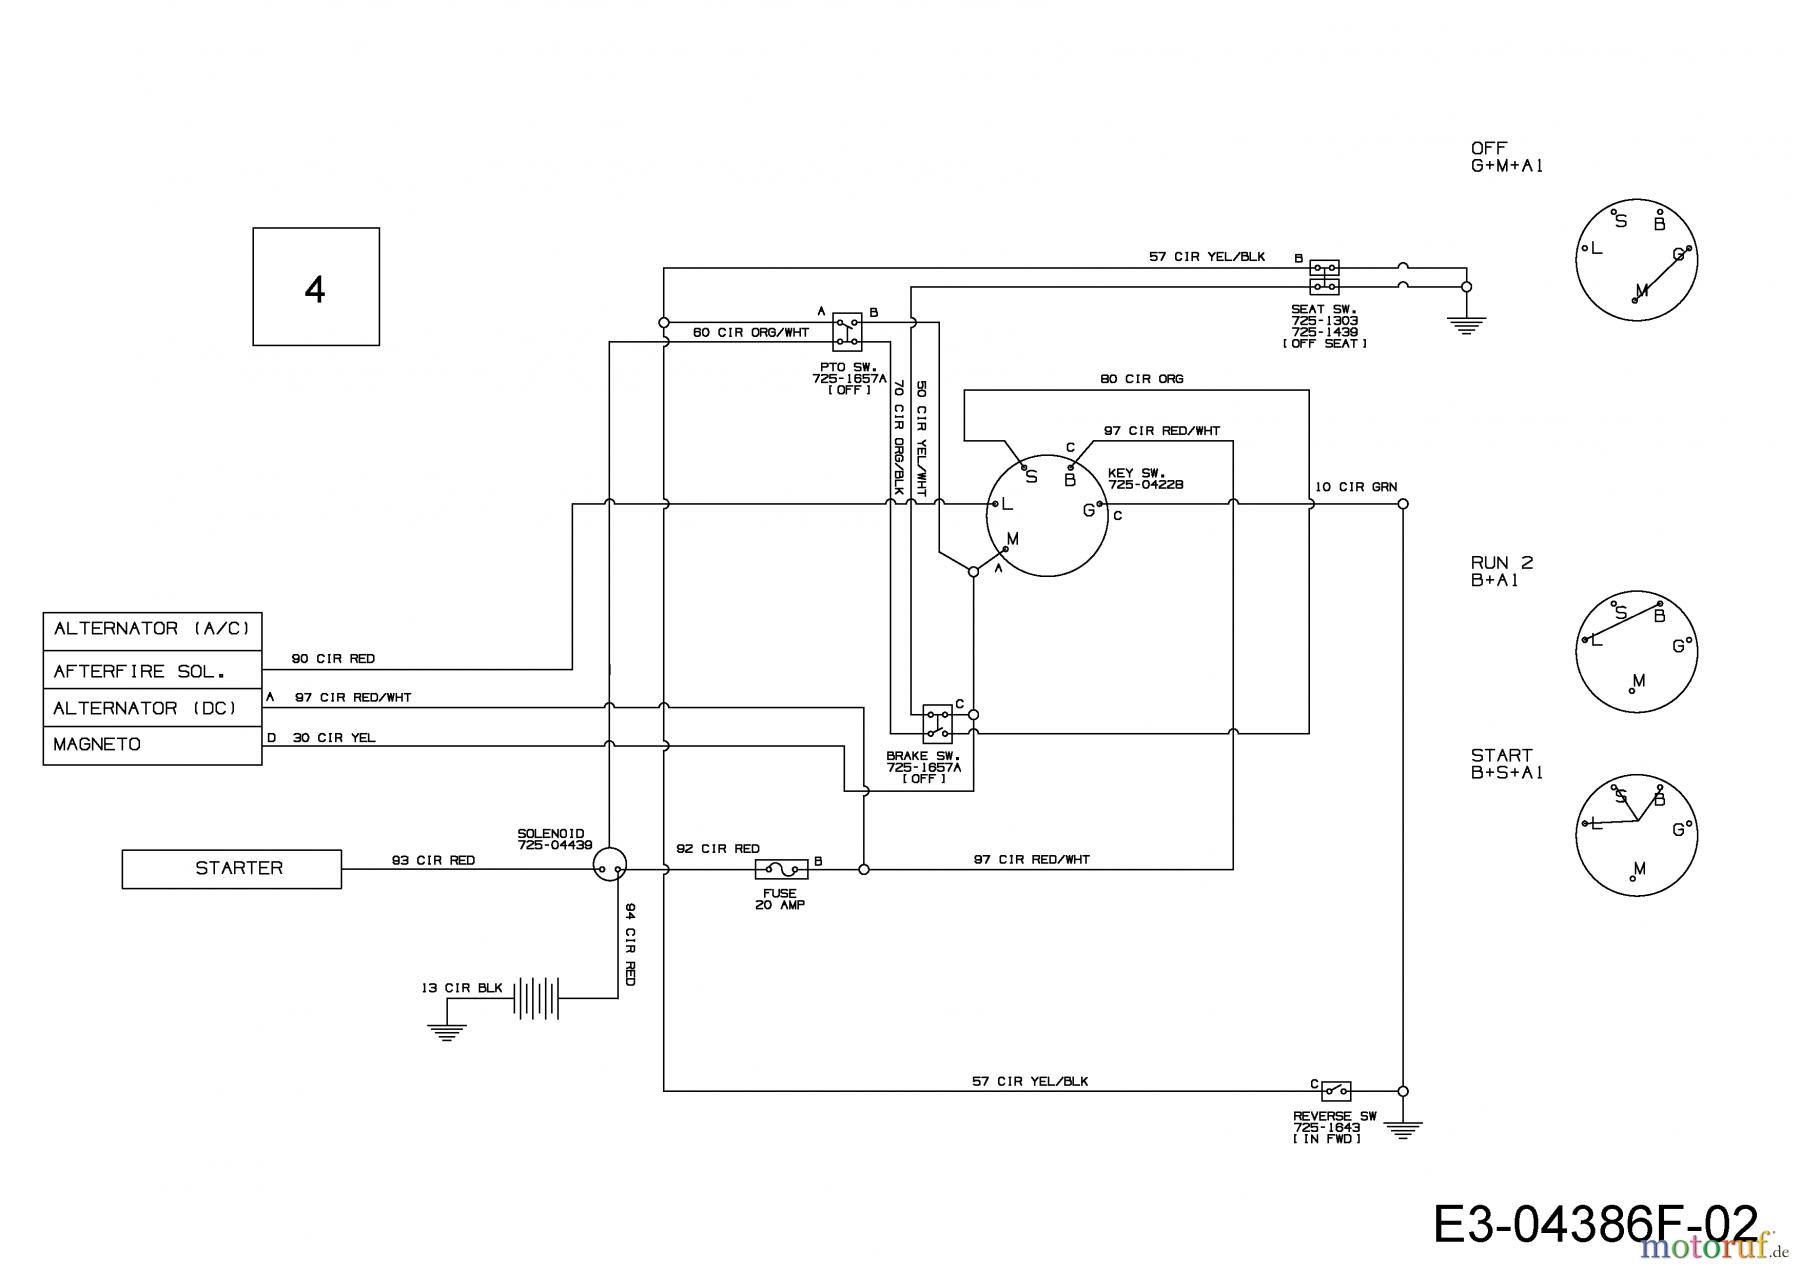 Wiring Diagram Mtd Lawn Tractor Wiring Diagram And By Mtd Lawnflite Wiring Diagram Wiring Diagram And Schemat Diagram Electrical Diagram Trailer Wiring Diagram